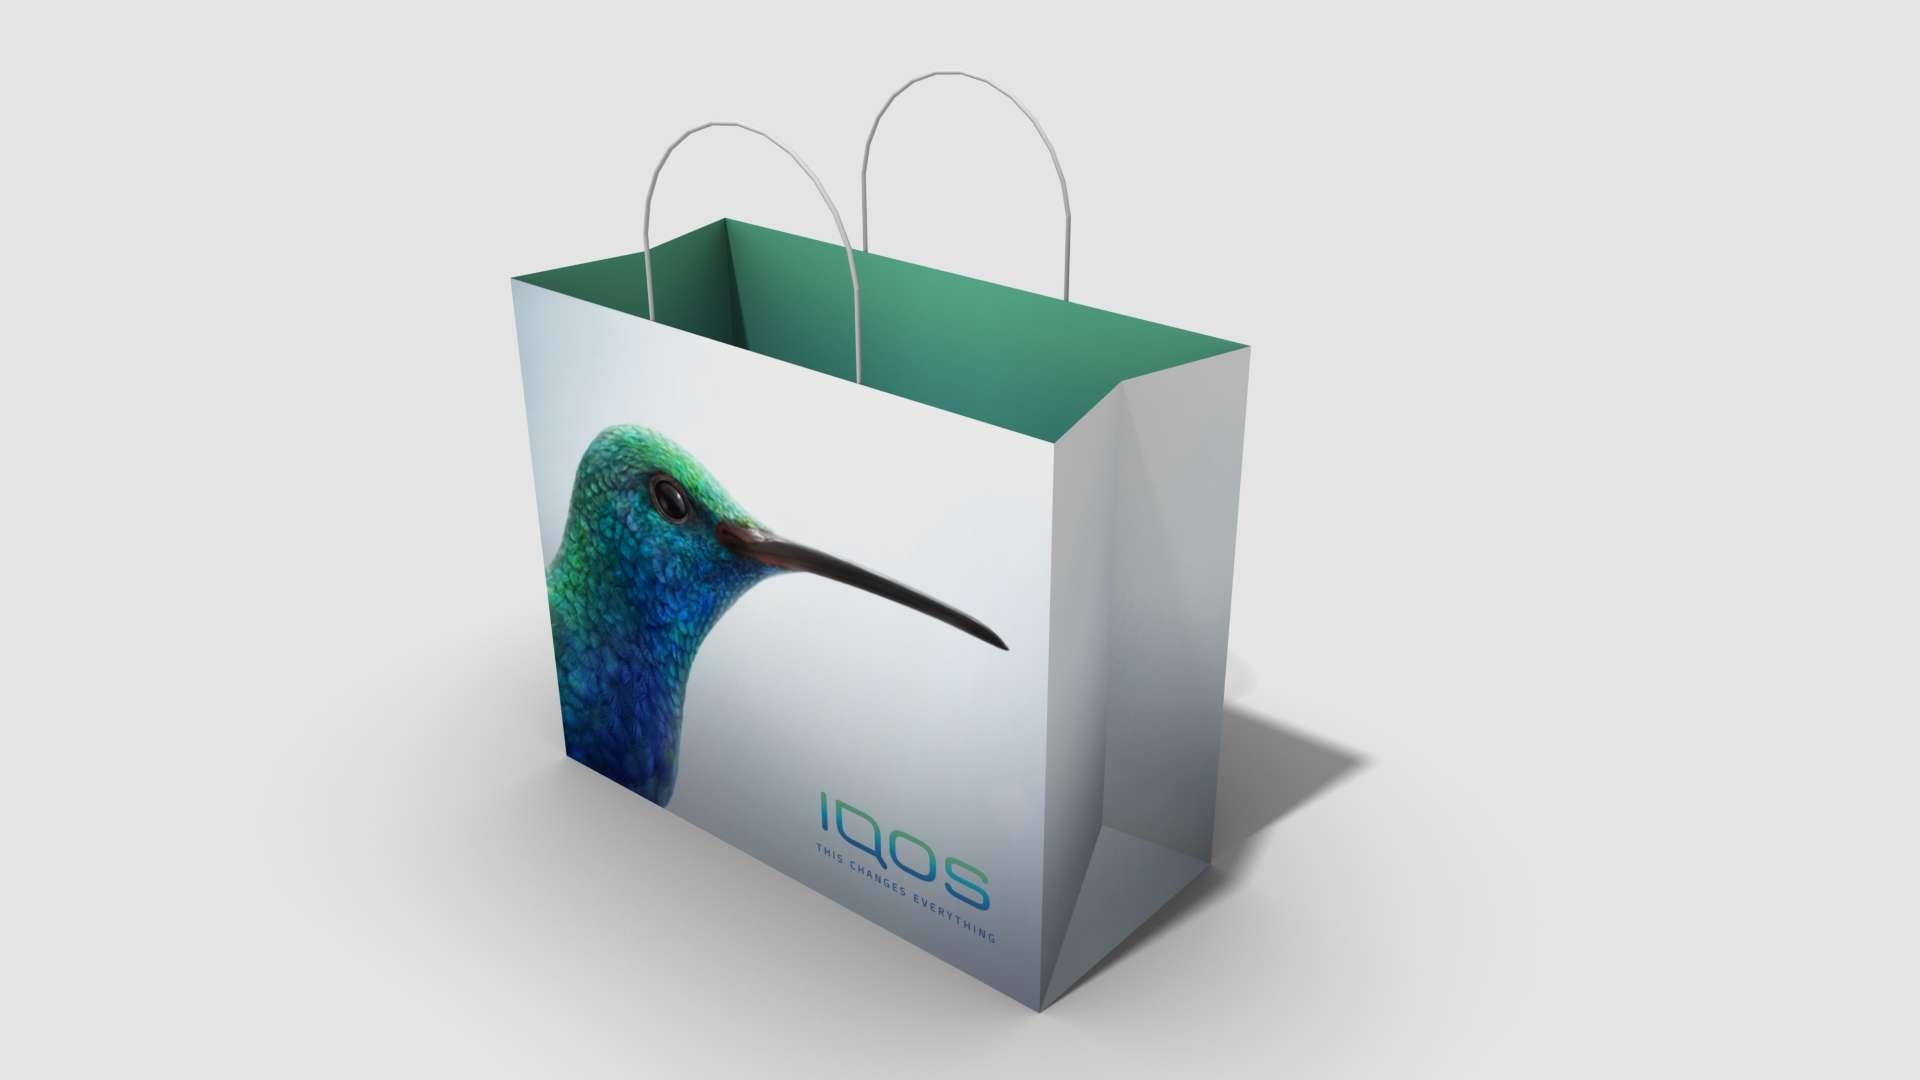 IQOS-paperbag-02